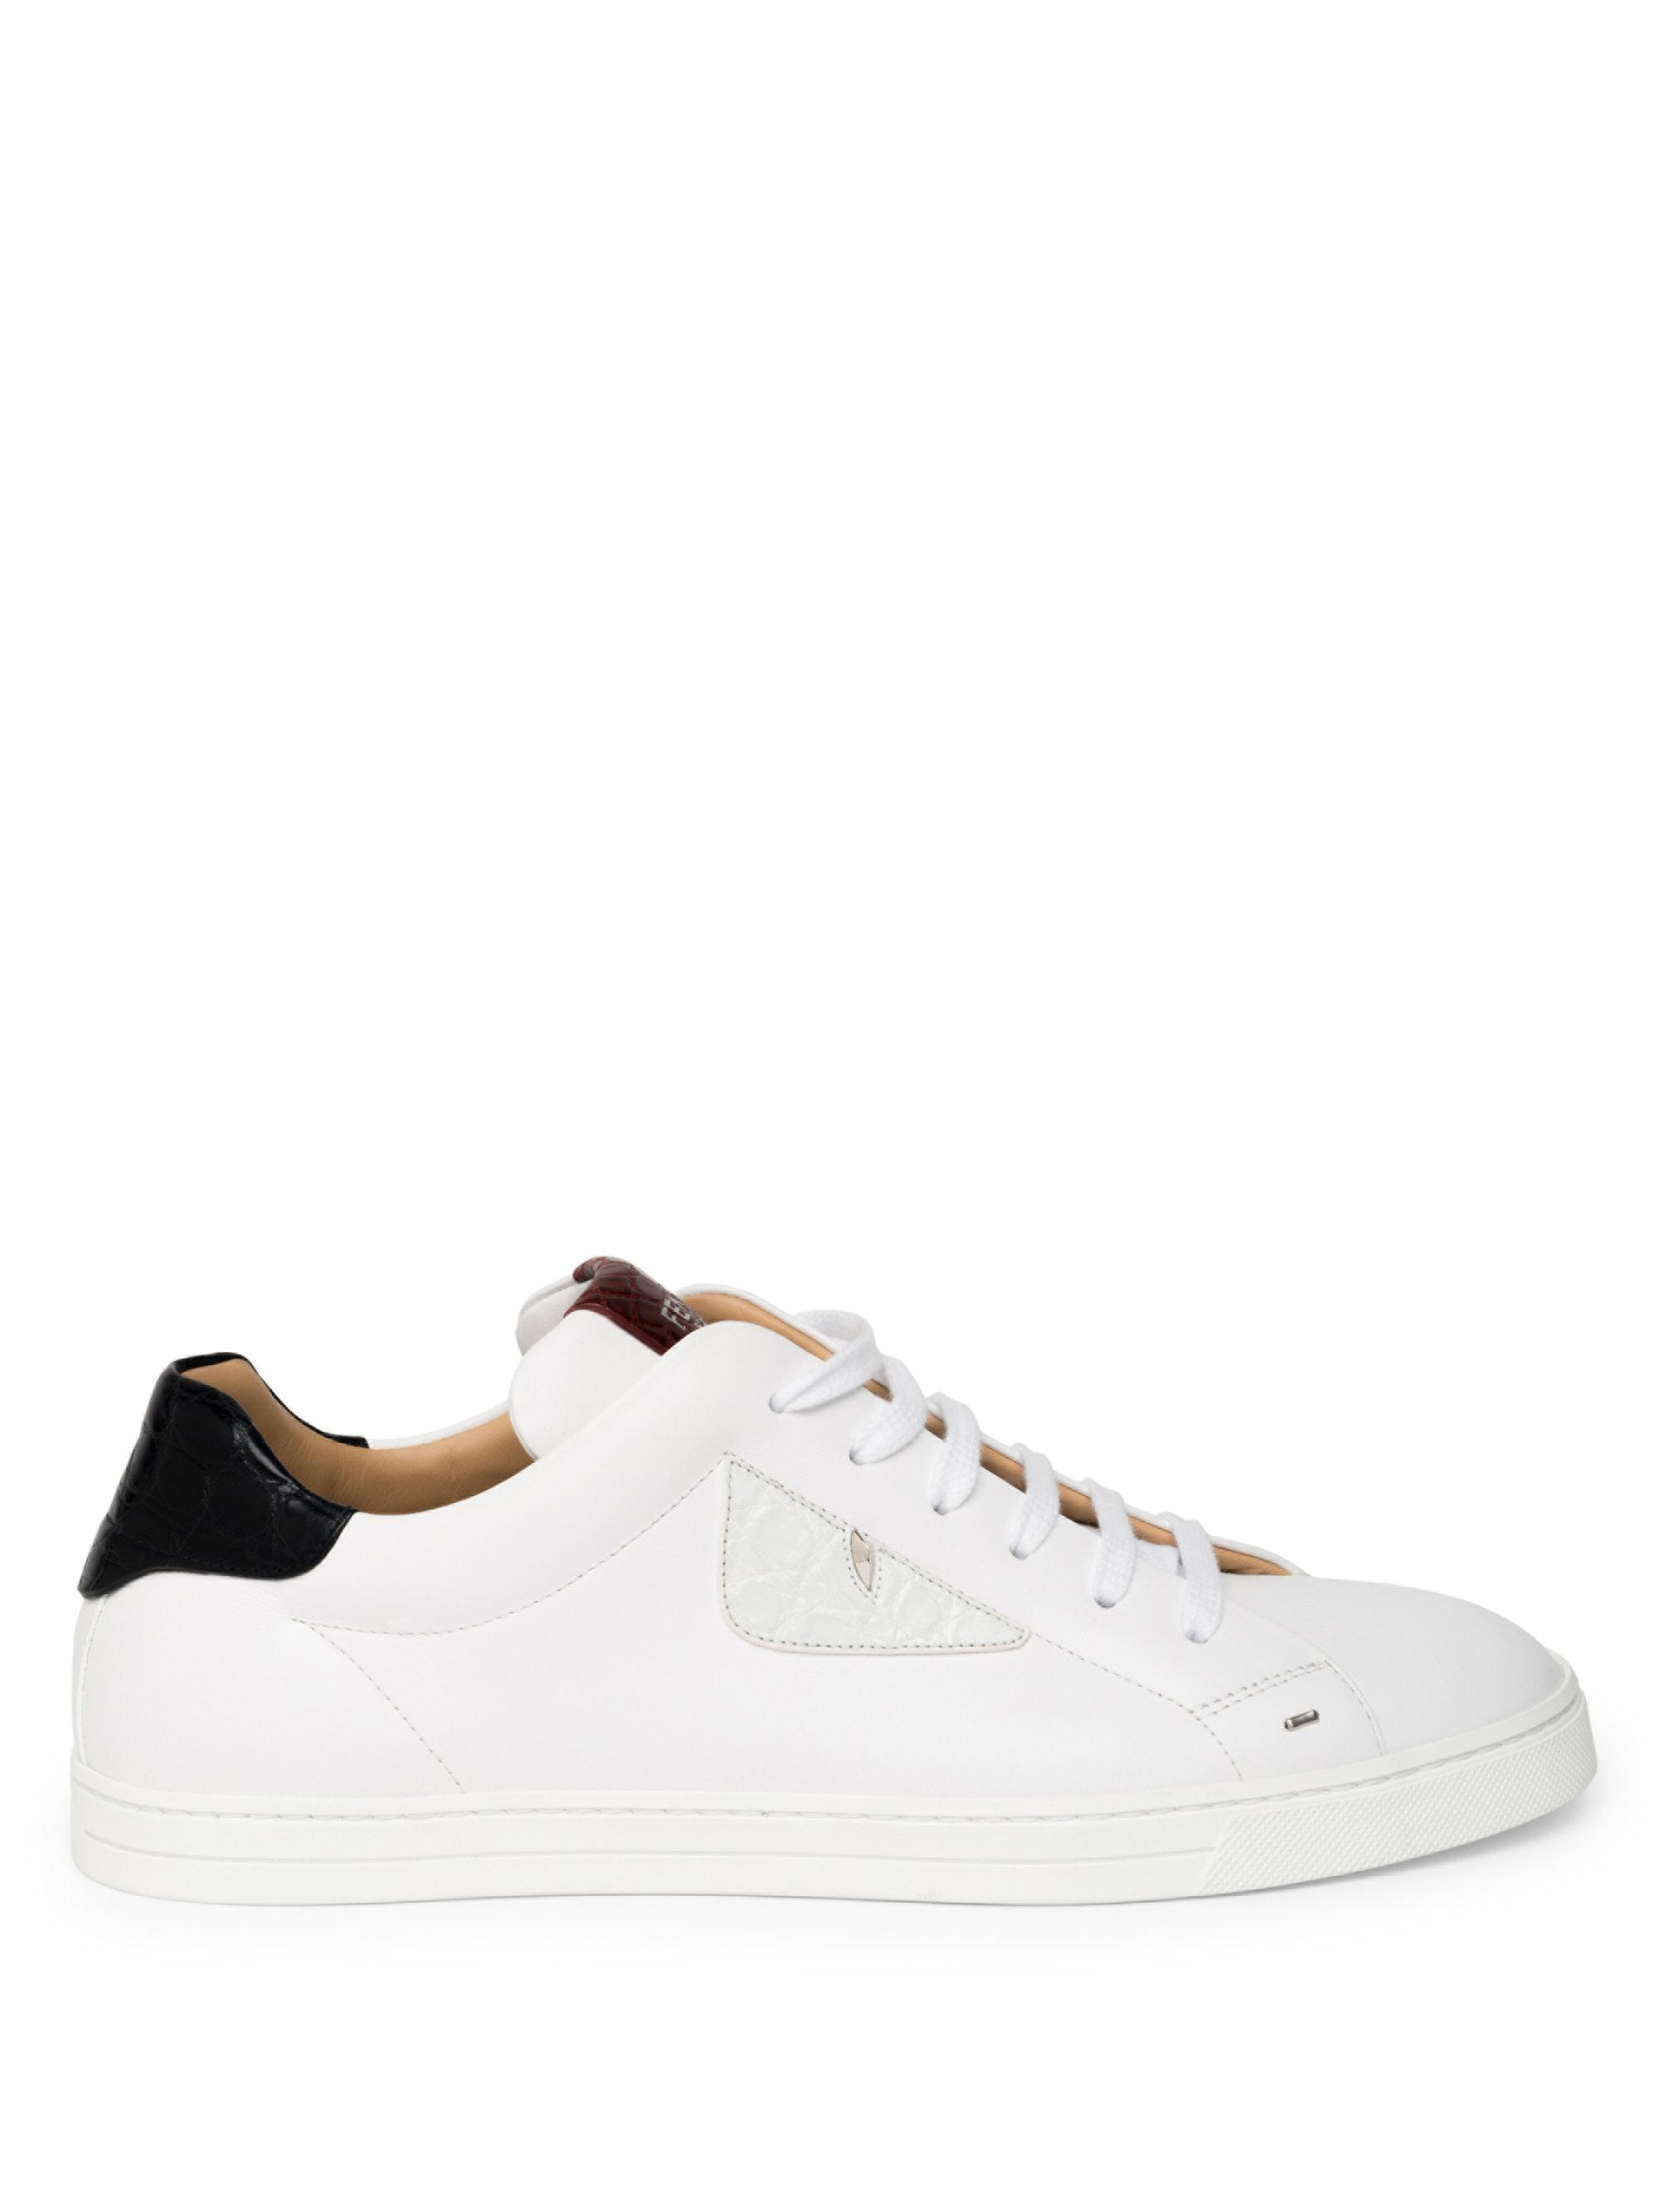 Fendi Caymen Leather Sneakers WHfKIAa